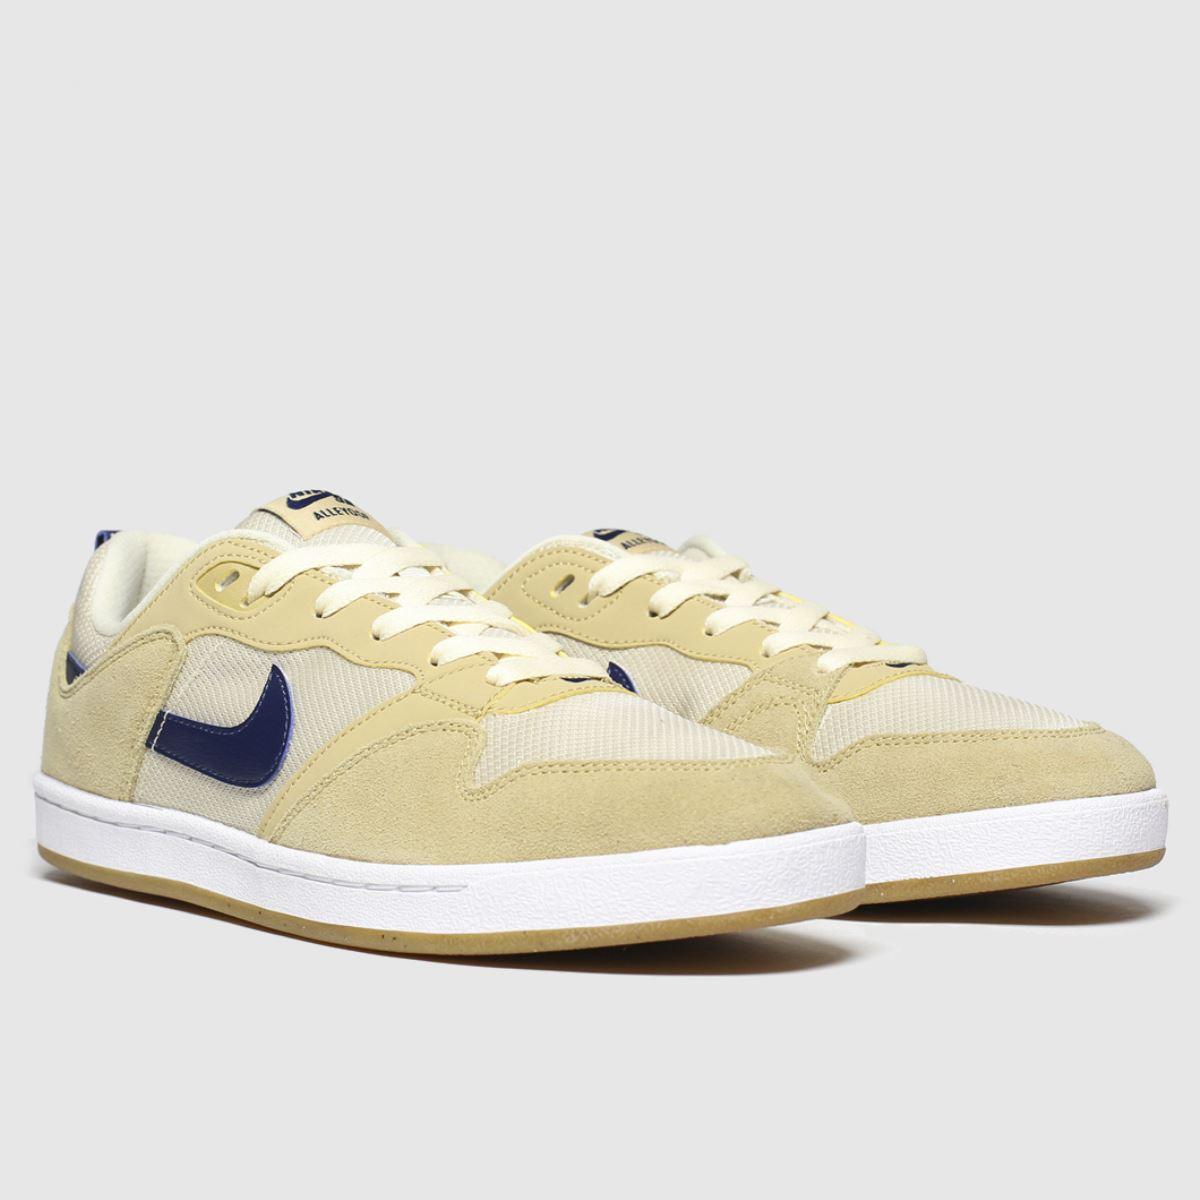 Nike SB Alleyoop Trainers S7-12 - £39.99 @ Schuh